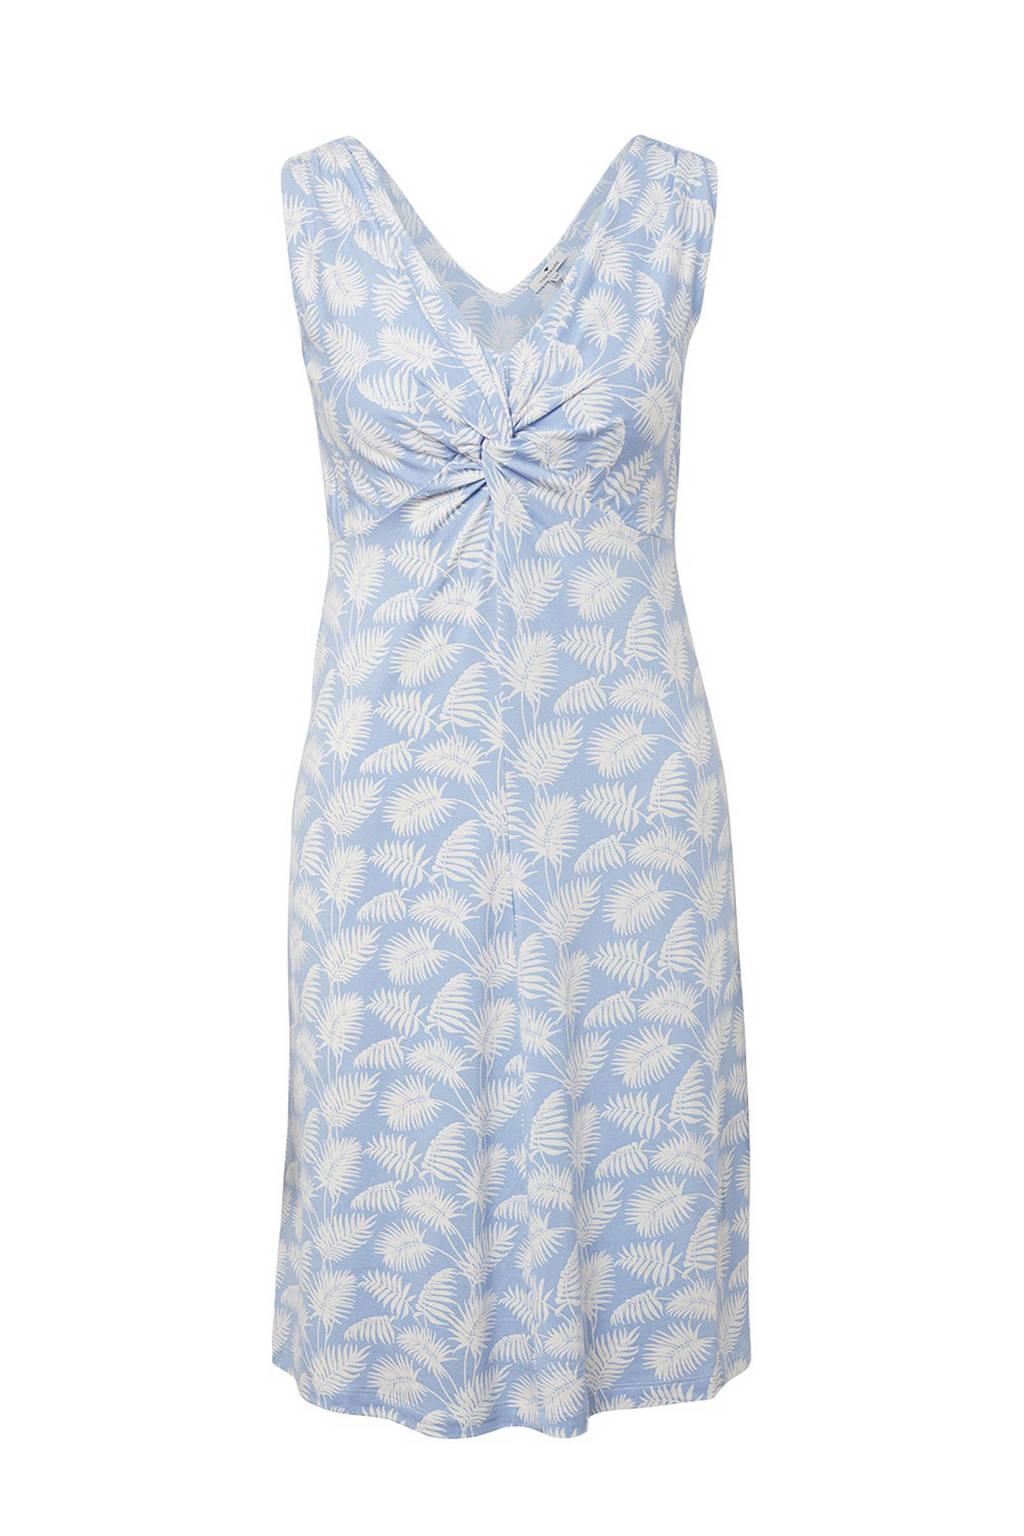 Tom Tailor jurk met bladprint blauw, Blauw/wit